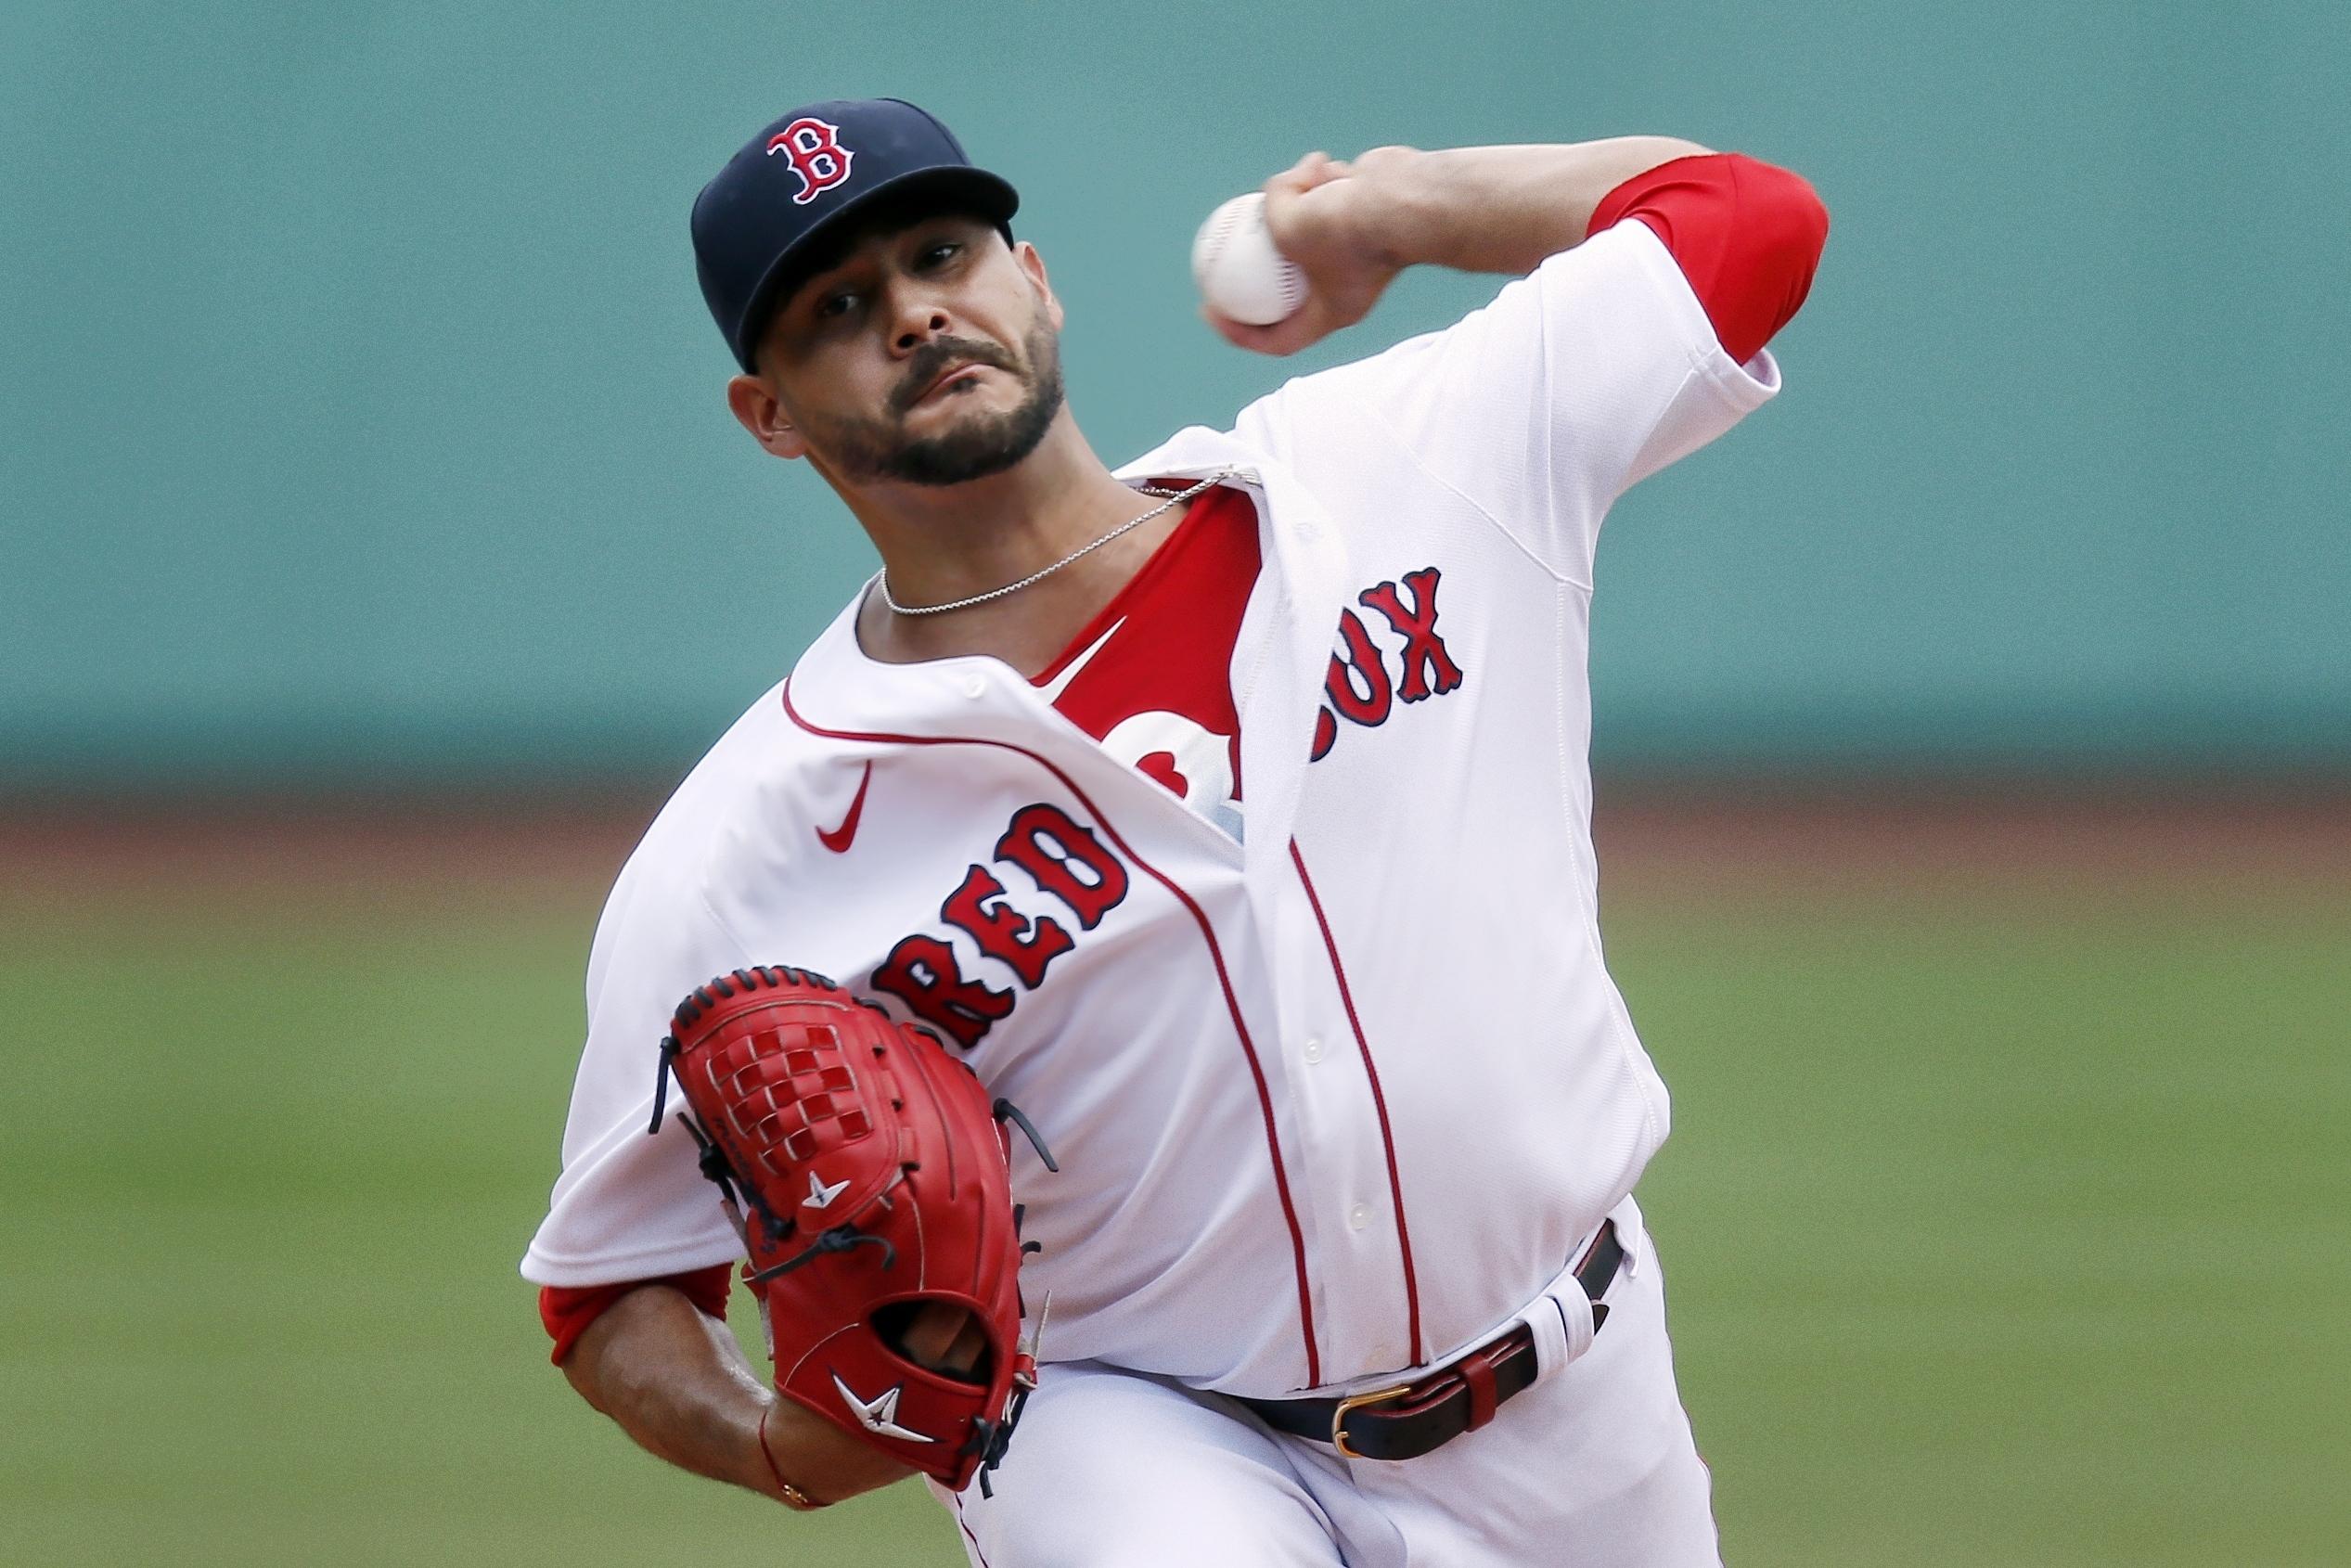 Boston Red Sox decline Martin Perez's $6.85M option, making left-handed  starter an MLB free agent - masslive.com